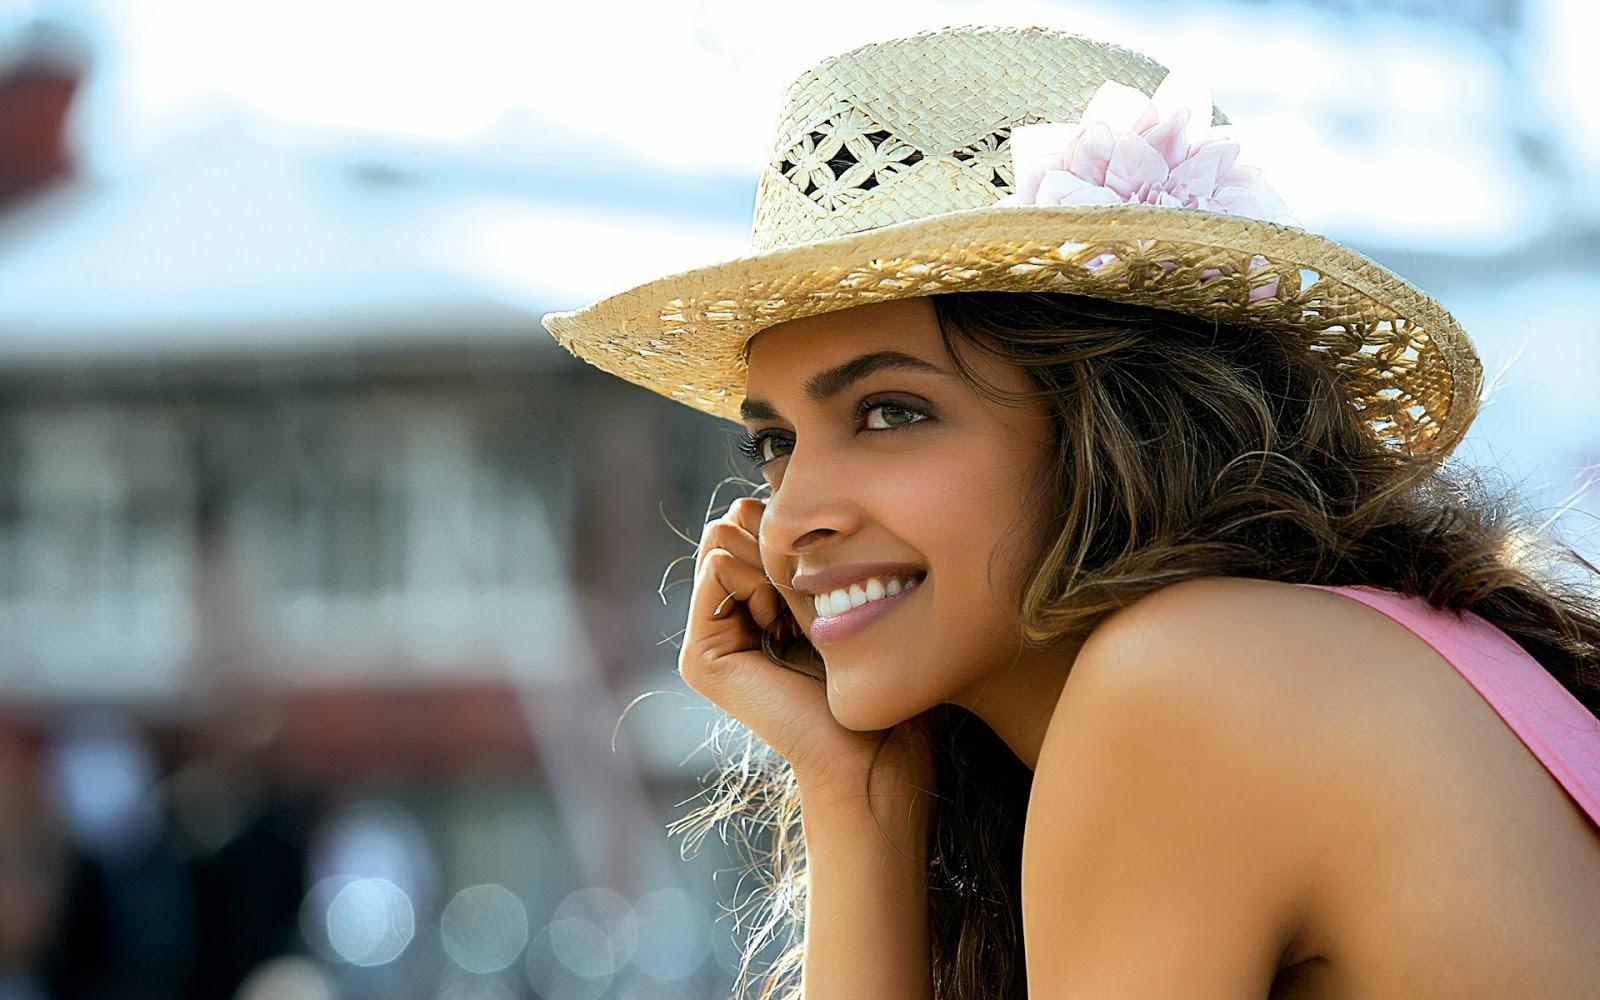 Deepika Padukone HD Wallpapers And Gossips - Everything 4u